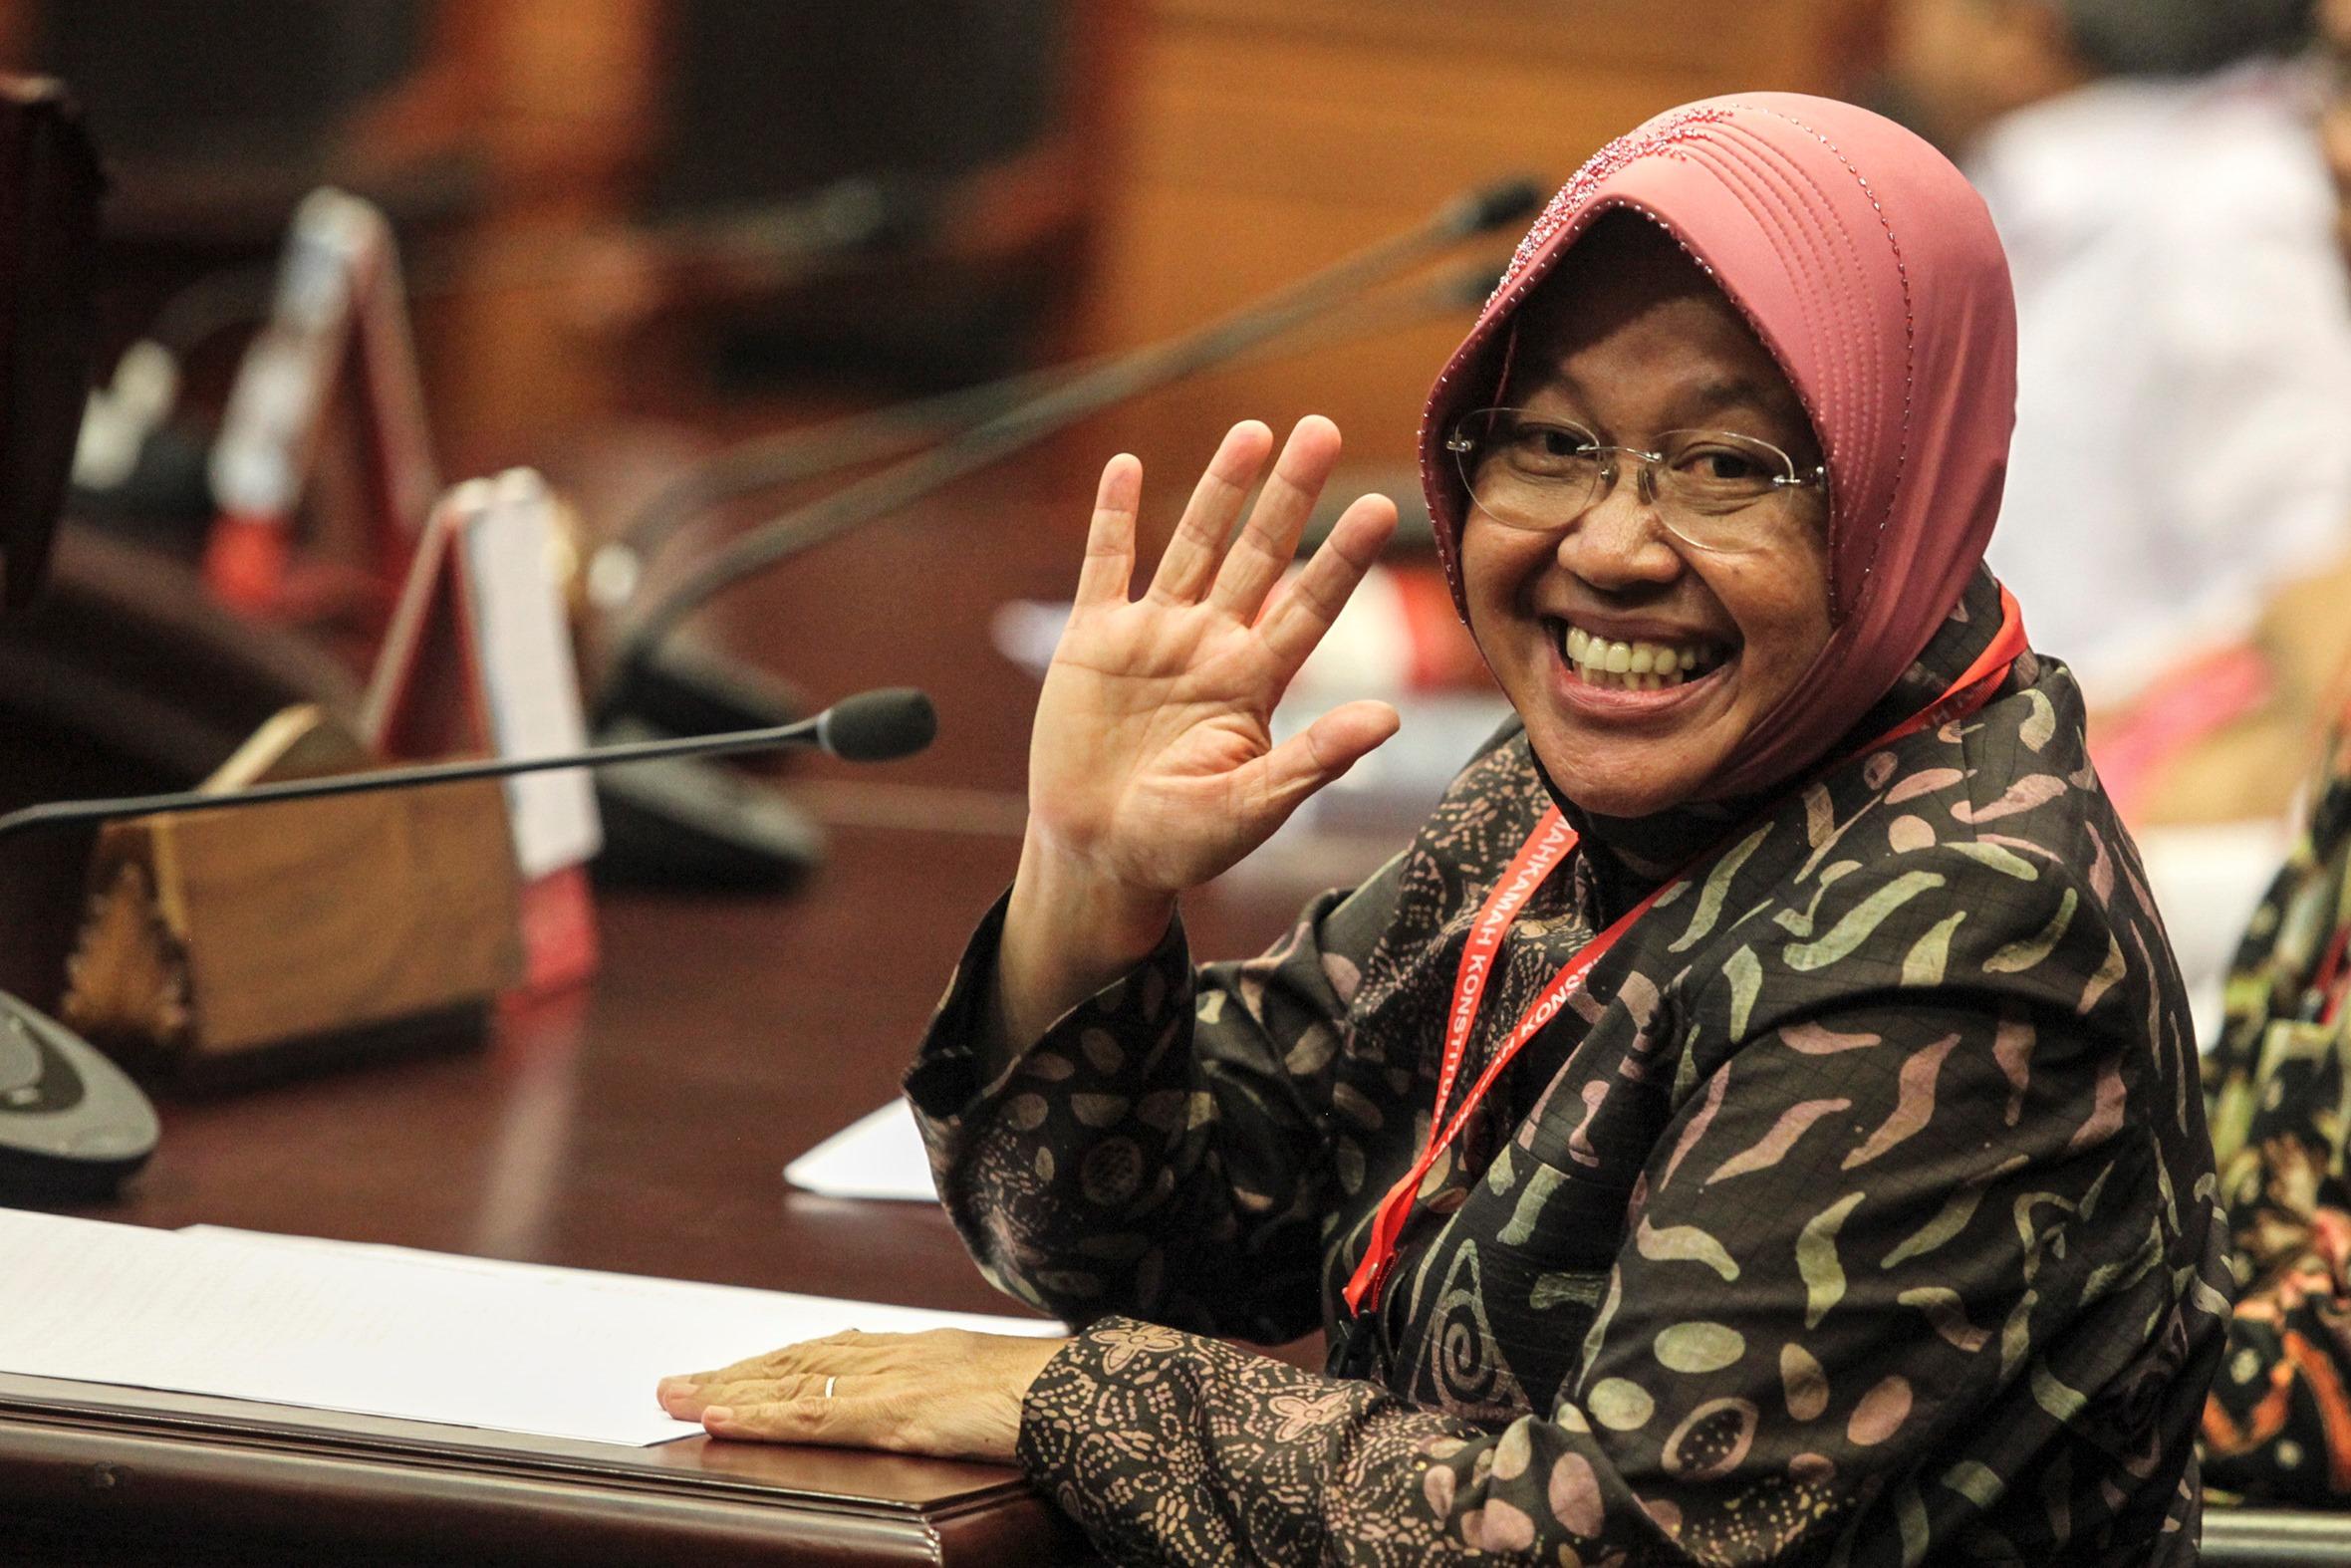 Doing Nahi Munkar: Beyond conventional rhetorics, this Muslimah mayor has shown how Islam became a life solution in Surabaya.